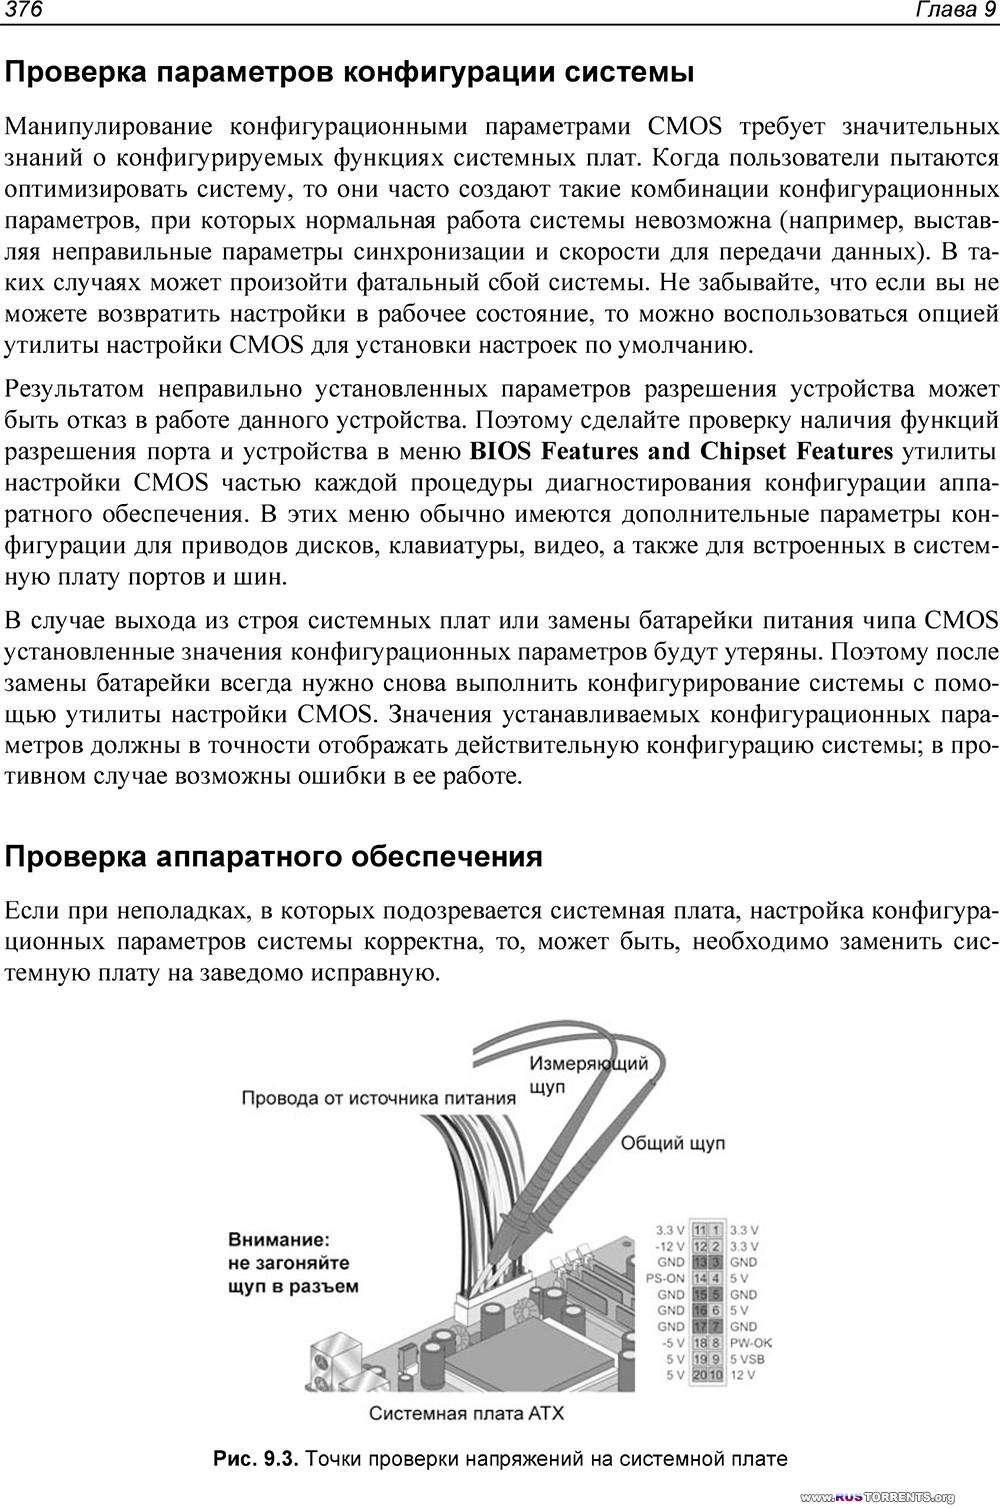 CompTIA A+. Установка, настройка, обслуживание и ремонт ПК | PDF